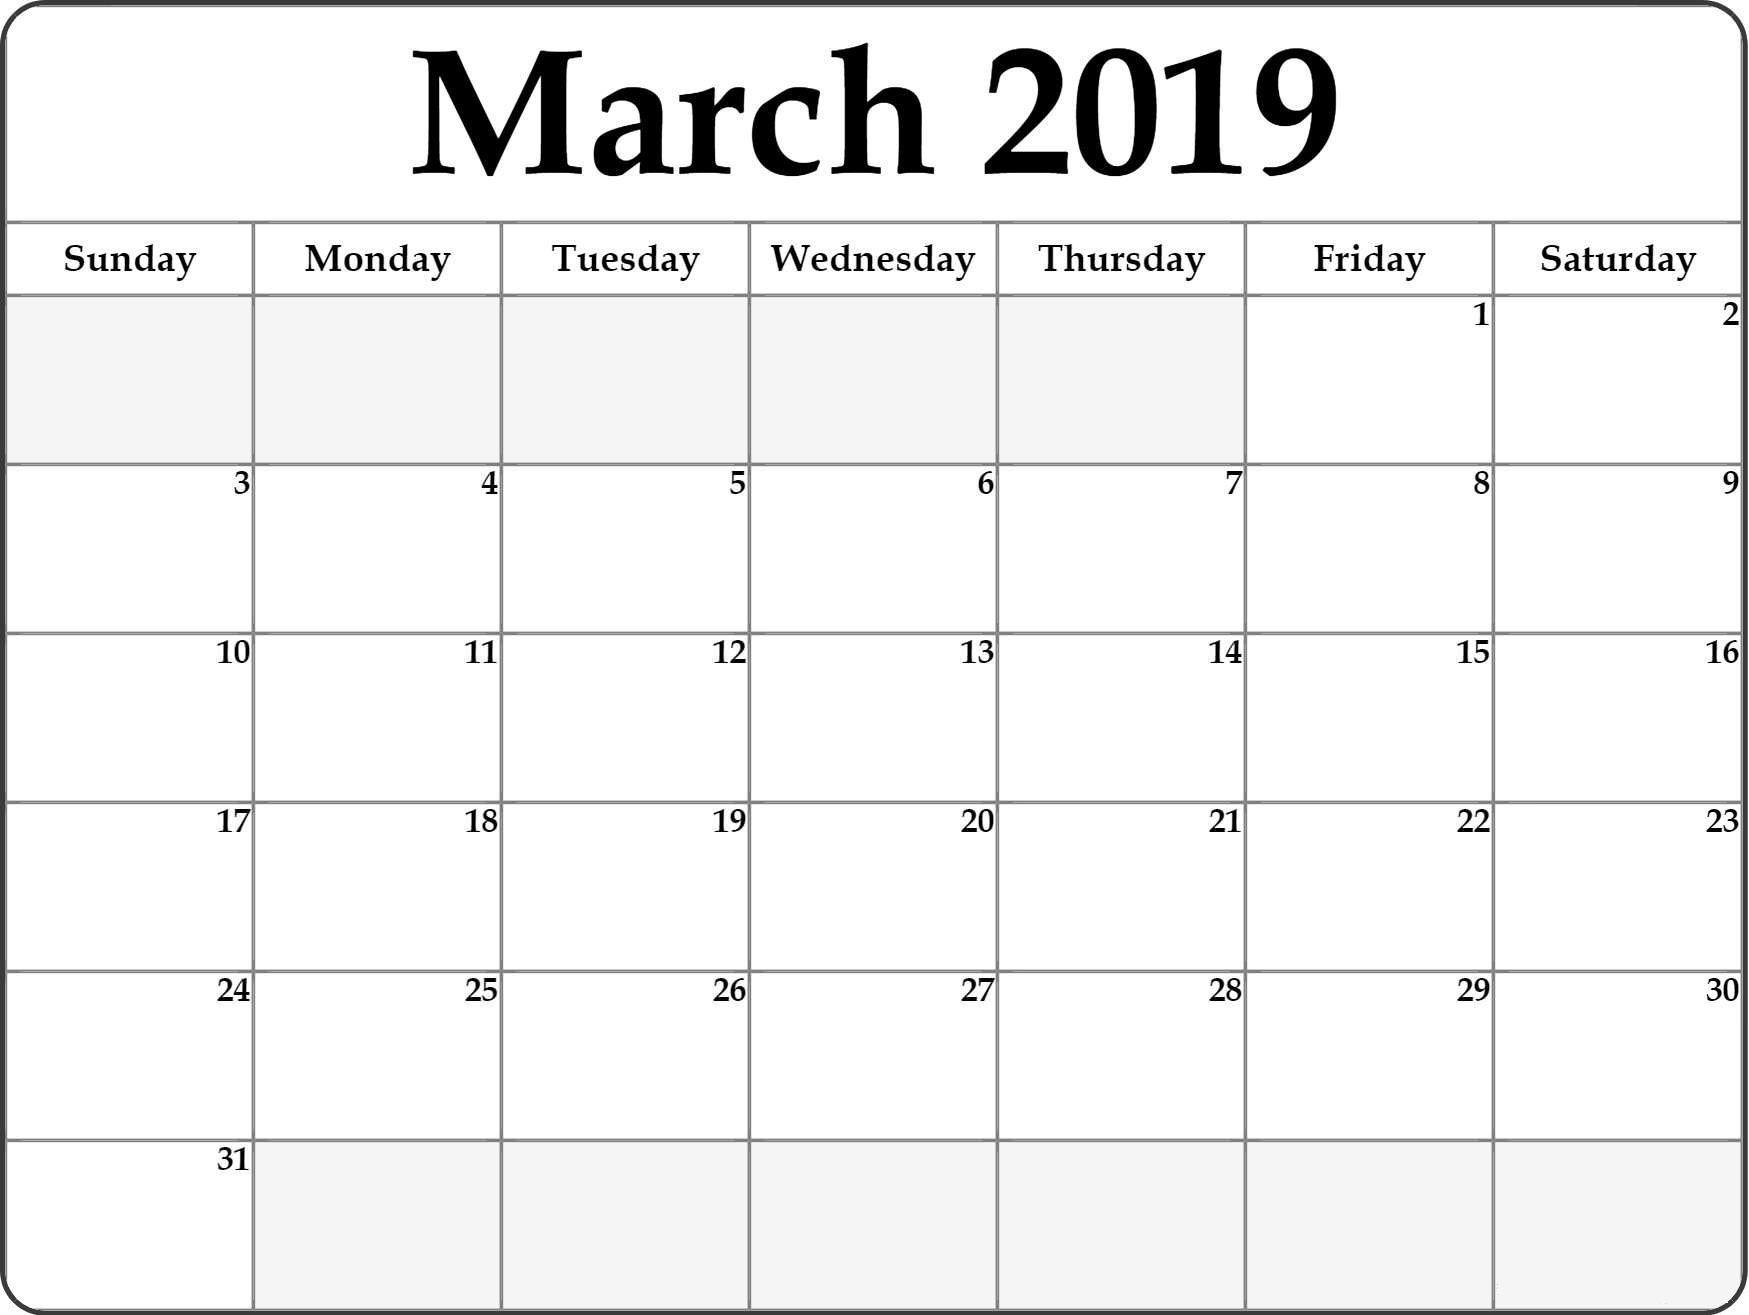 Blank March 2019 Calendar Printable | Blank Monthly Calendar